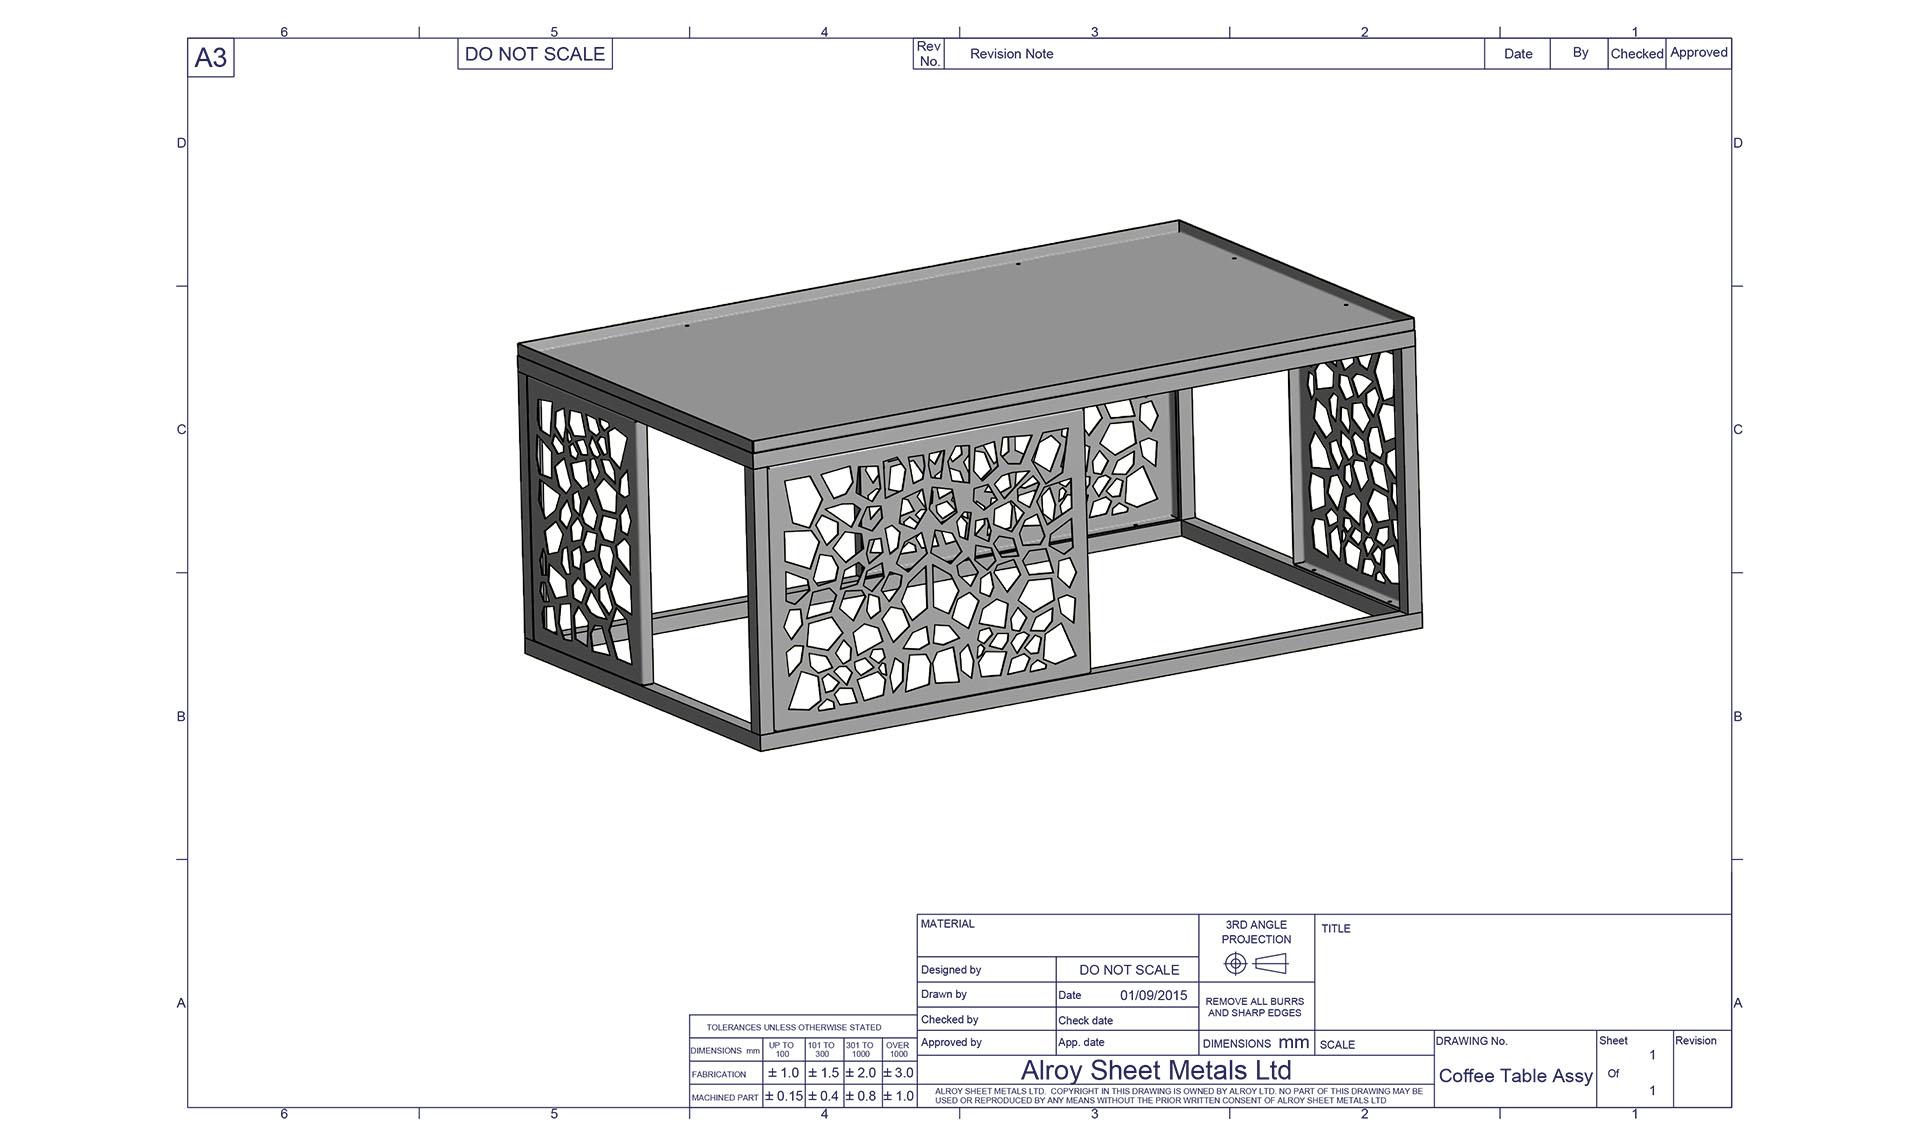 sheet metal prototyping 2 - Alroys